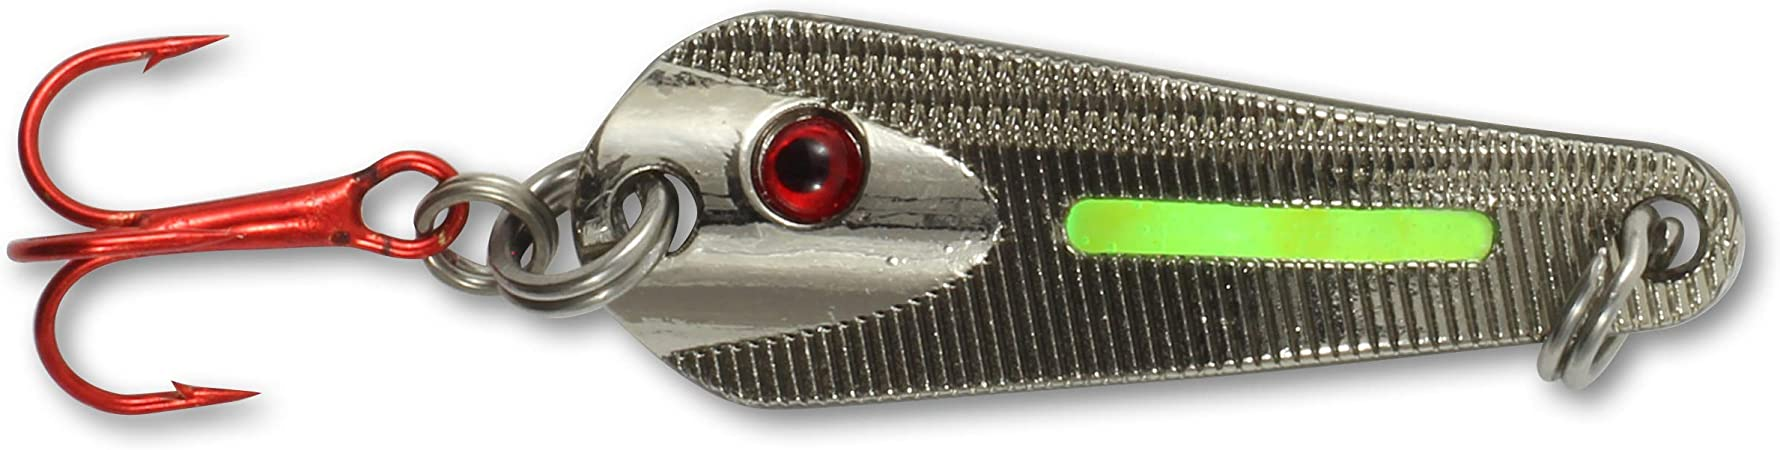 Northland Tackle Glo Shot Spoon Metallic Silver GSS3-11 1//8 oz Ice Fishing